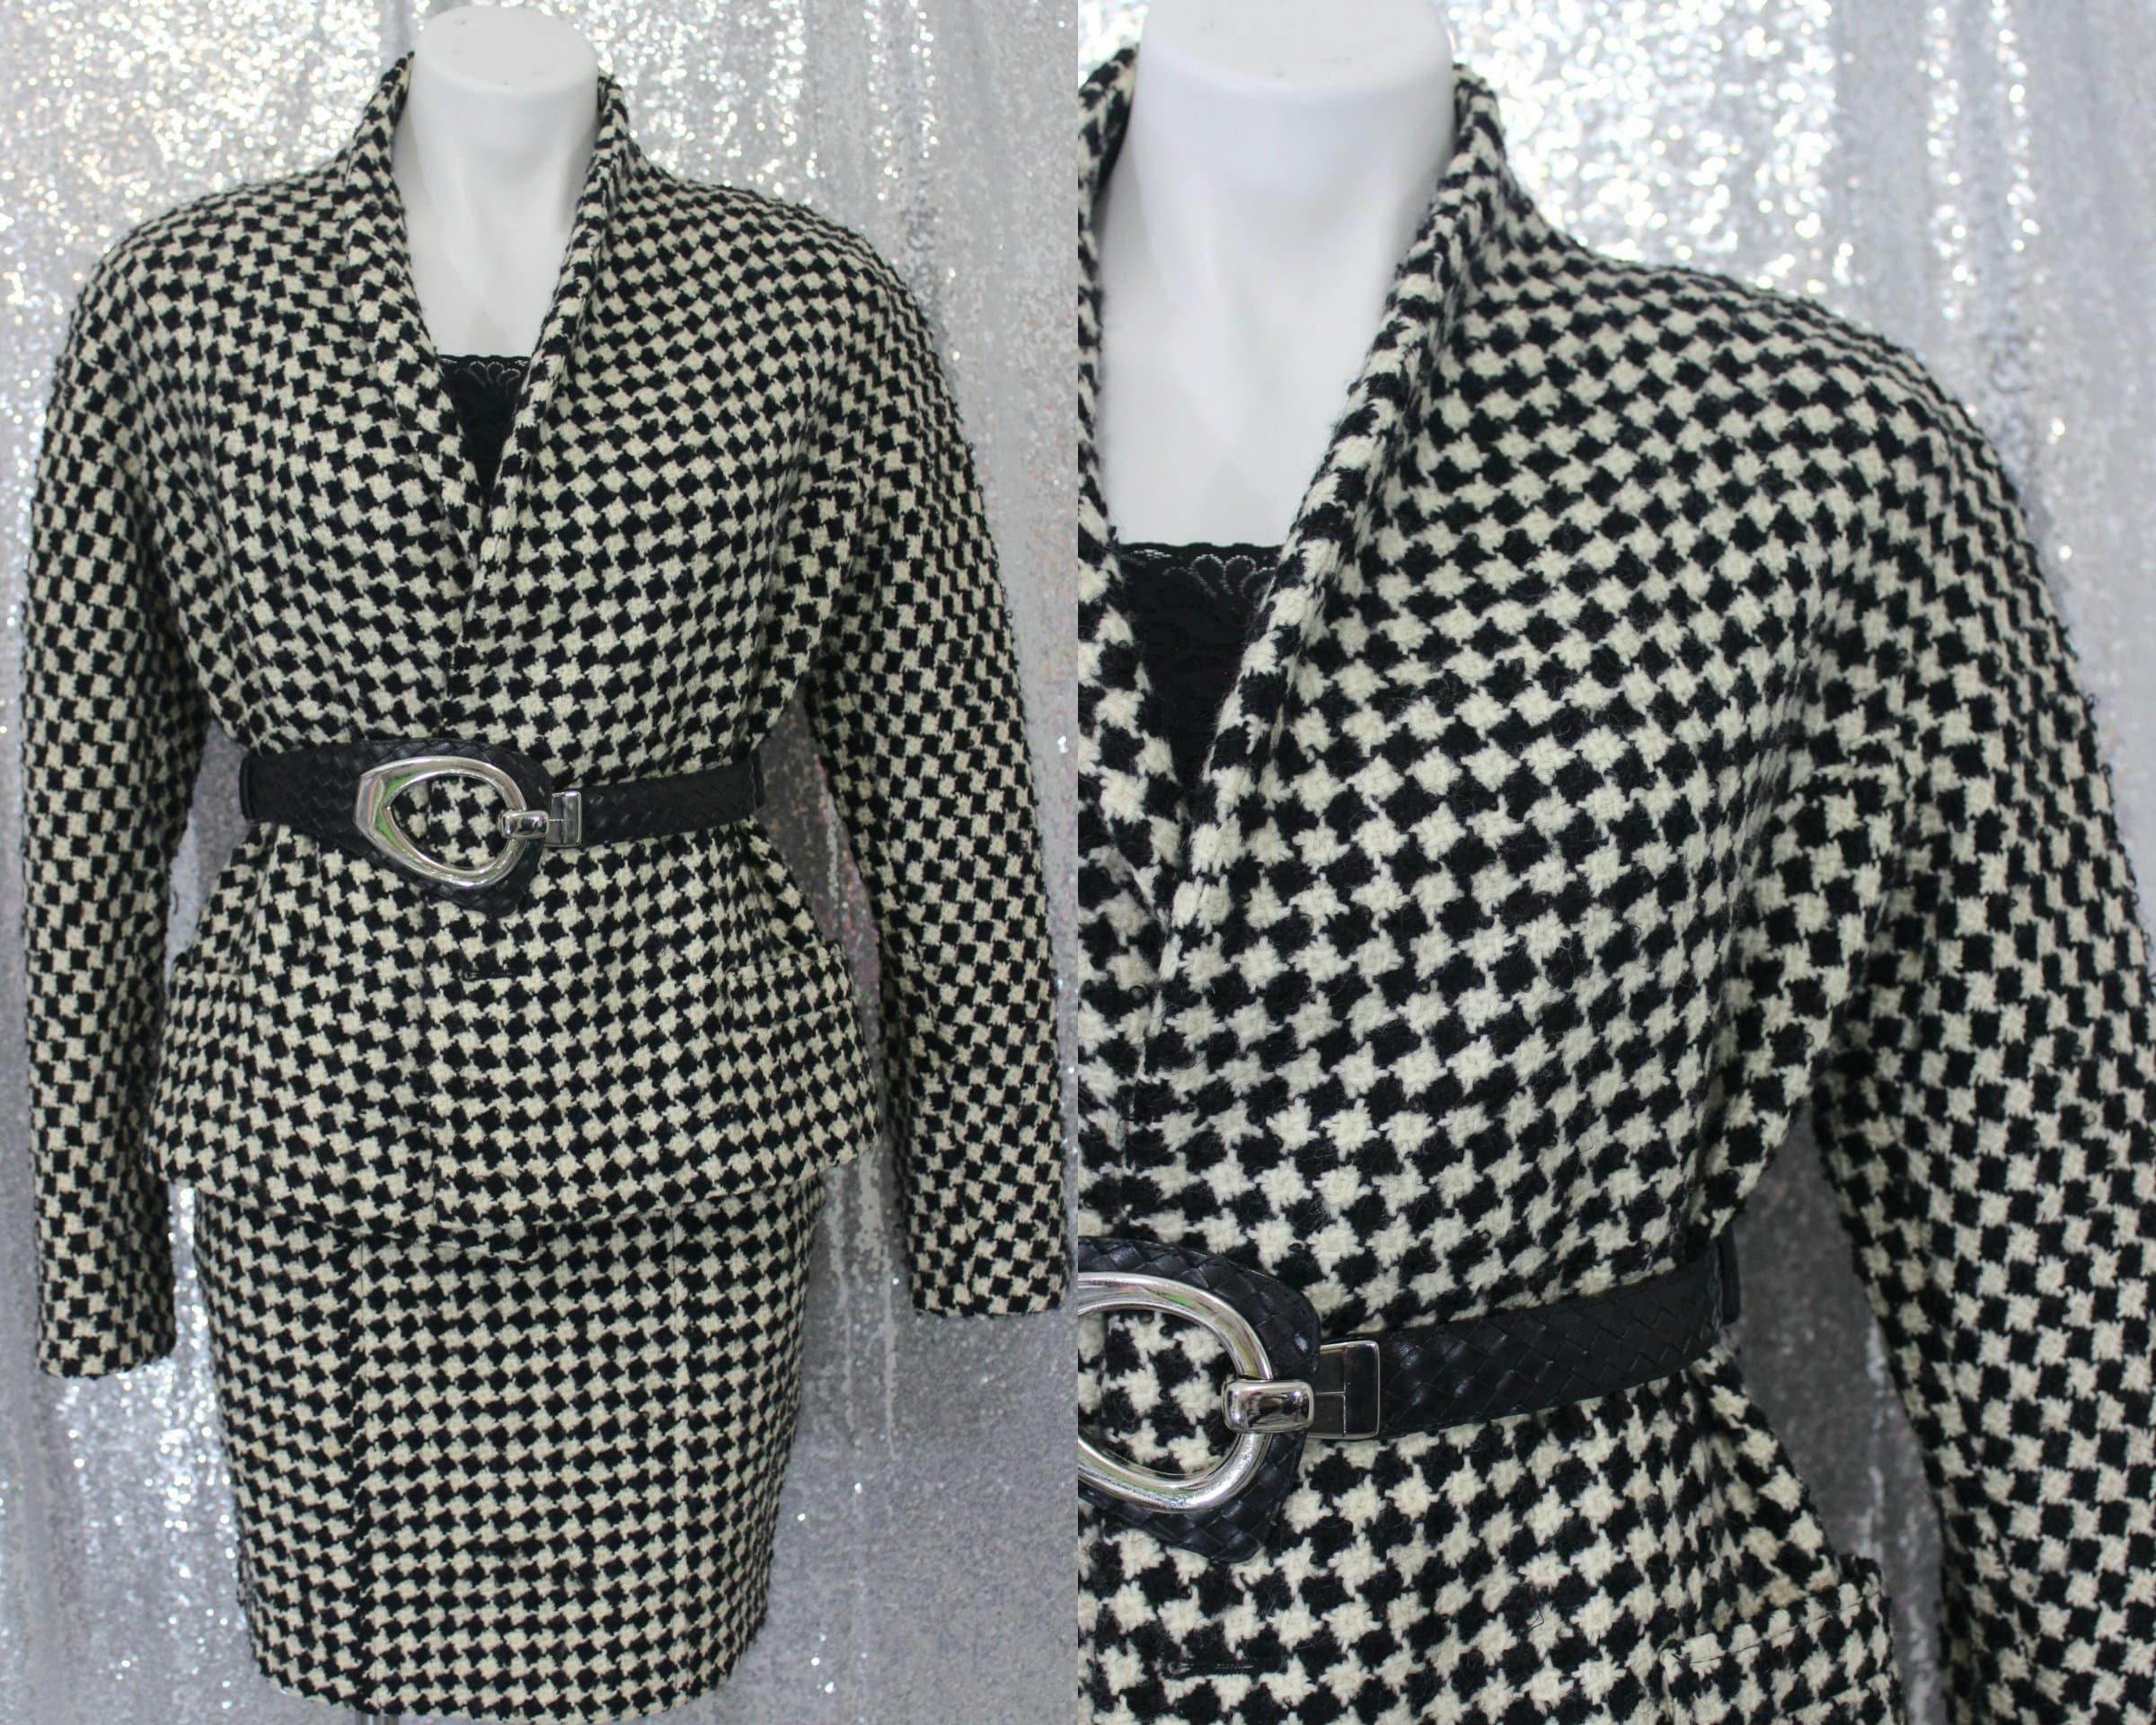 Vintage Scarf Styles -1920s to 1960s 80S 90S Vintage Neiman Marcus X Calvin Klein Black  White Checker Wool Blazer  Skirt Suit Set - Xs Small Iconic Business Designer Mod $0.00 AT vintagedancer.com